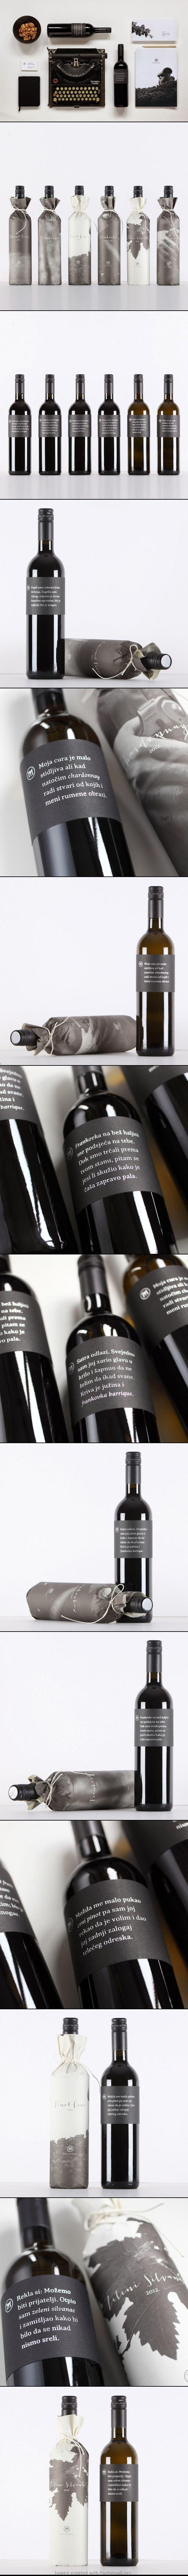 http://www.packagingoftheworld.com/2014/01/honest-wines-matkovic.html